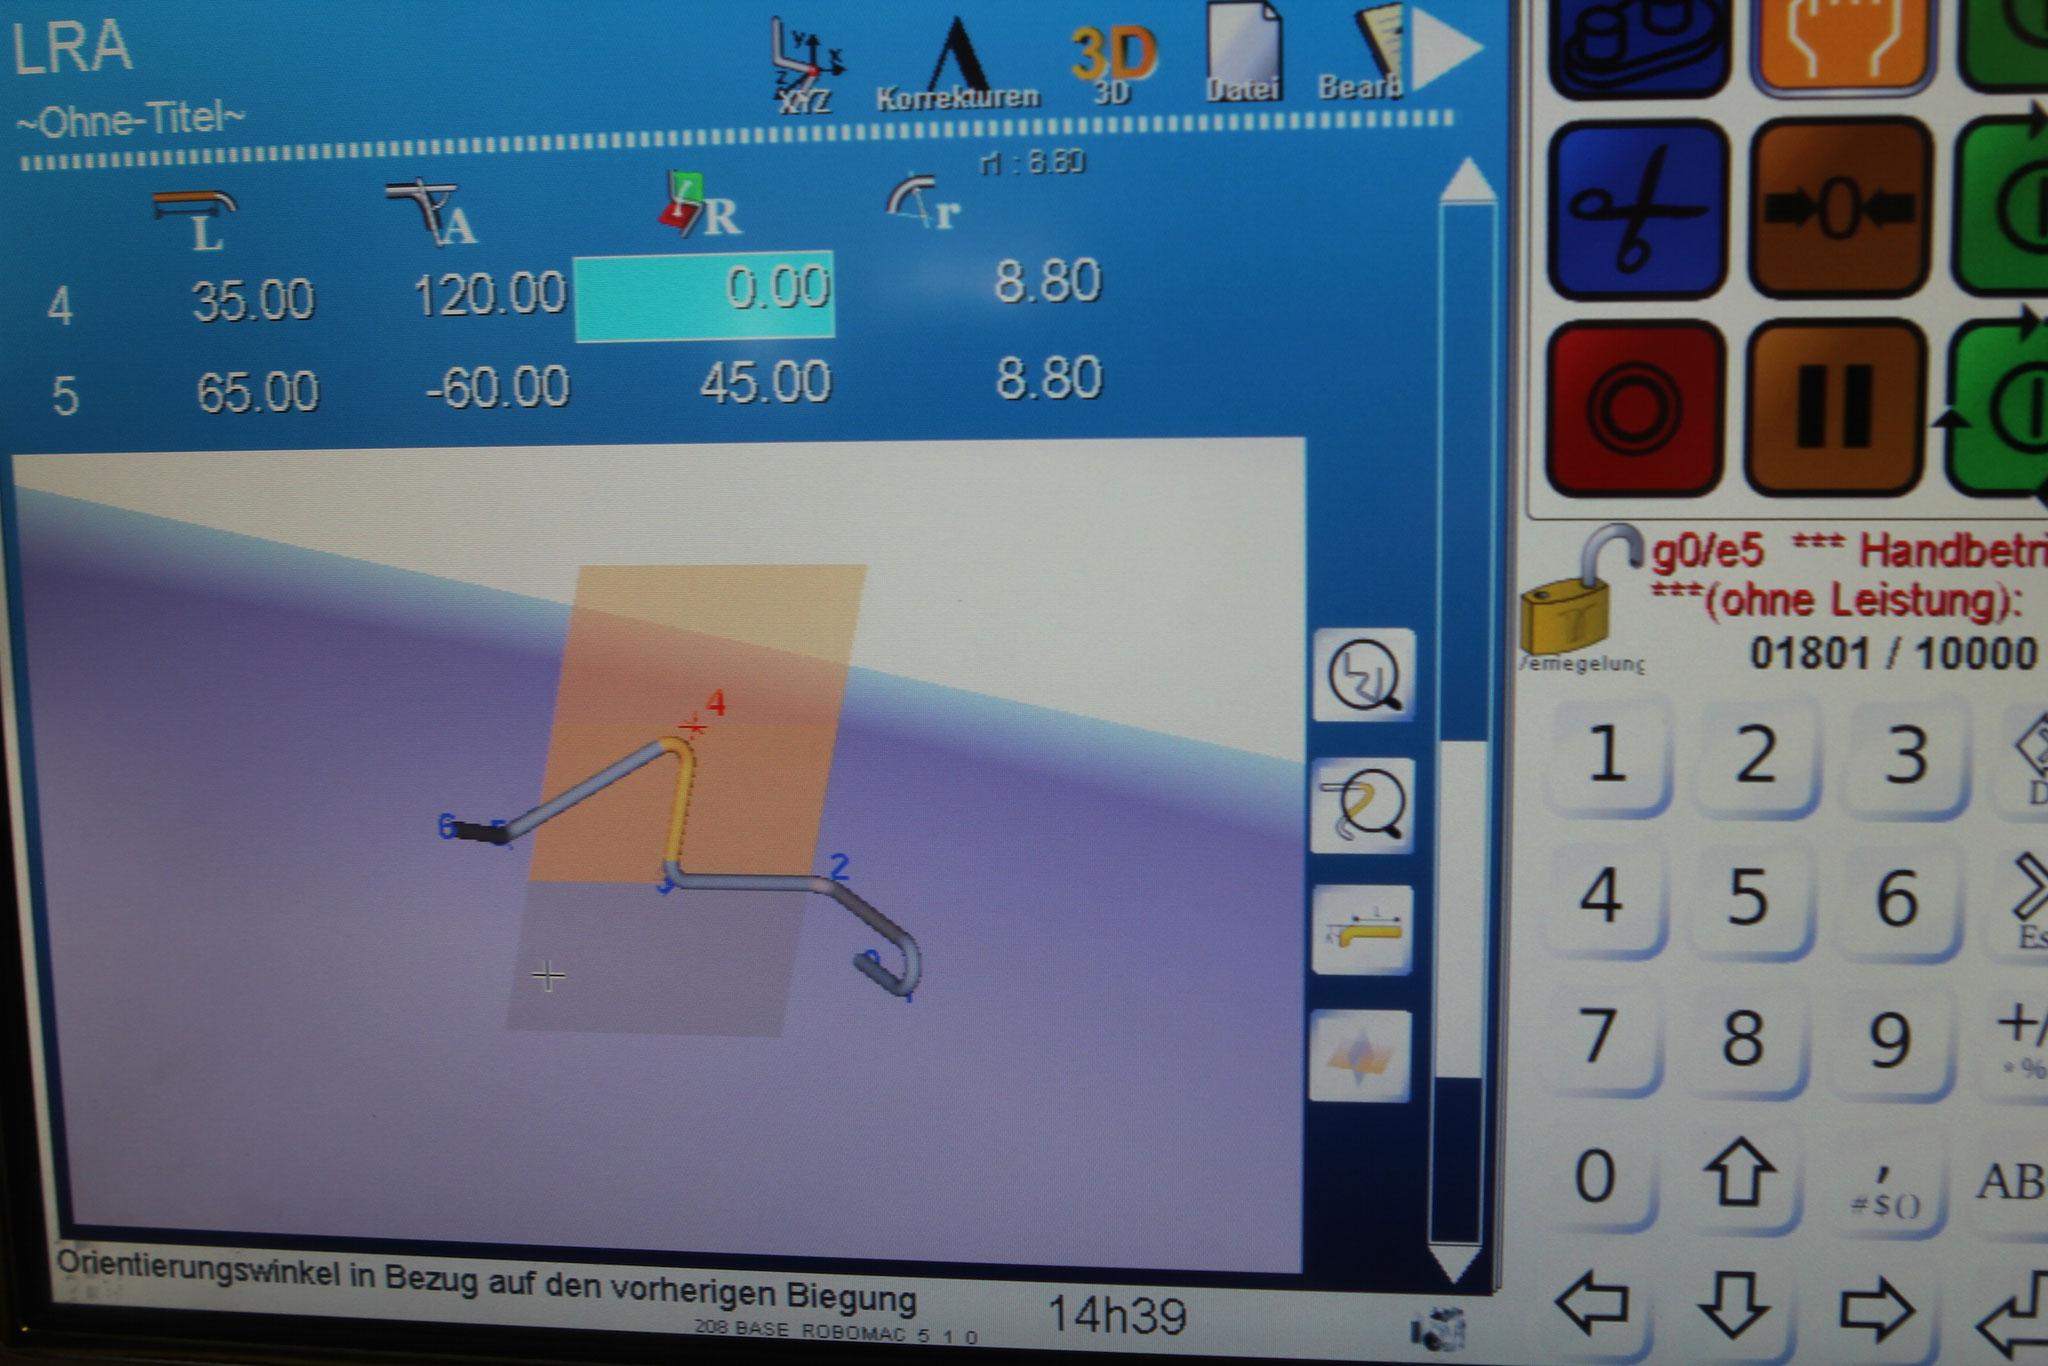 Konstruktive 3D-Daten werden im Anschluss an eine unserer CNC-Biegemaschinen übertragen.